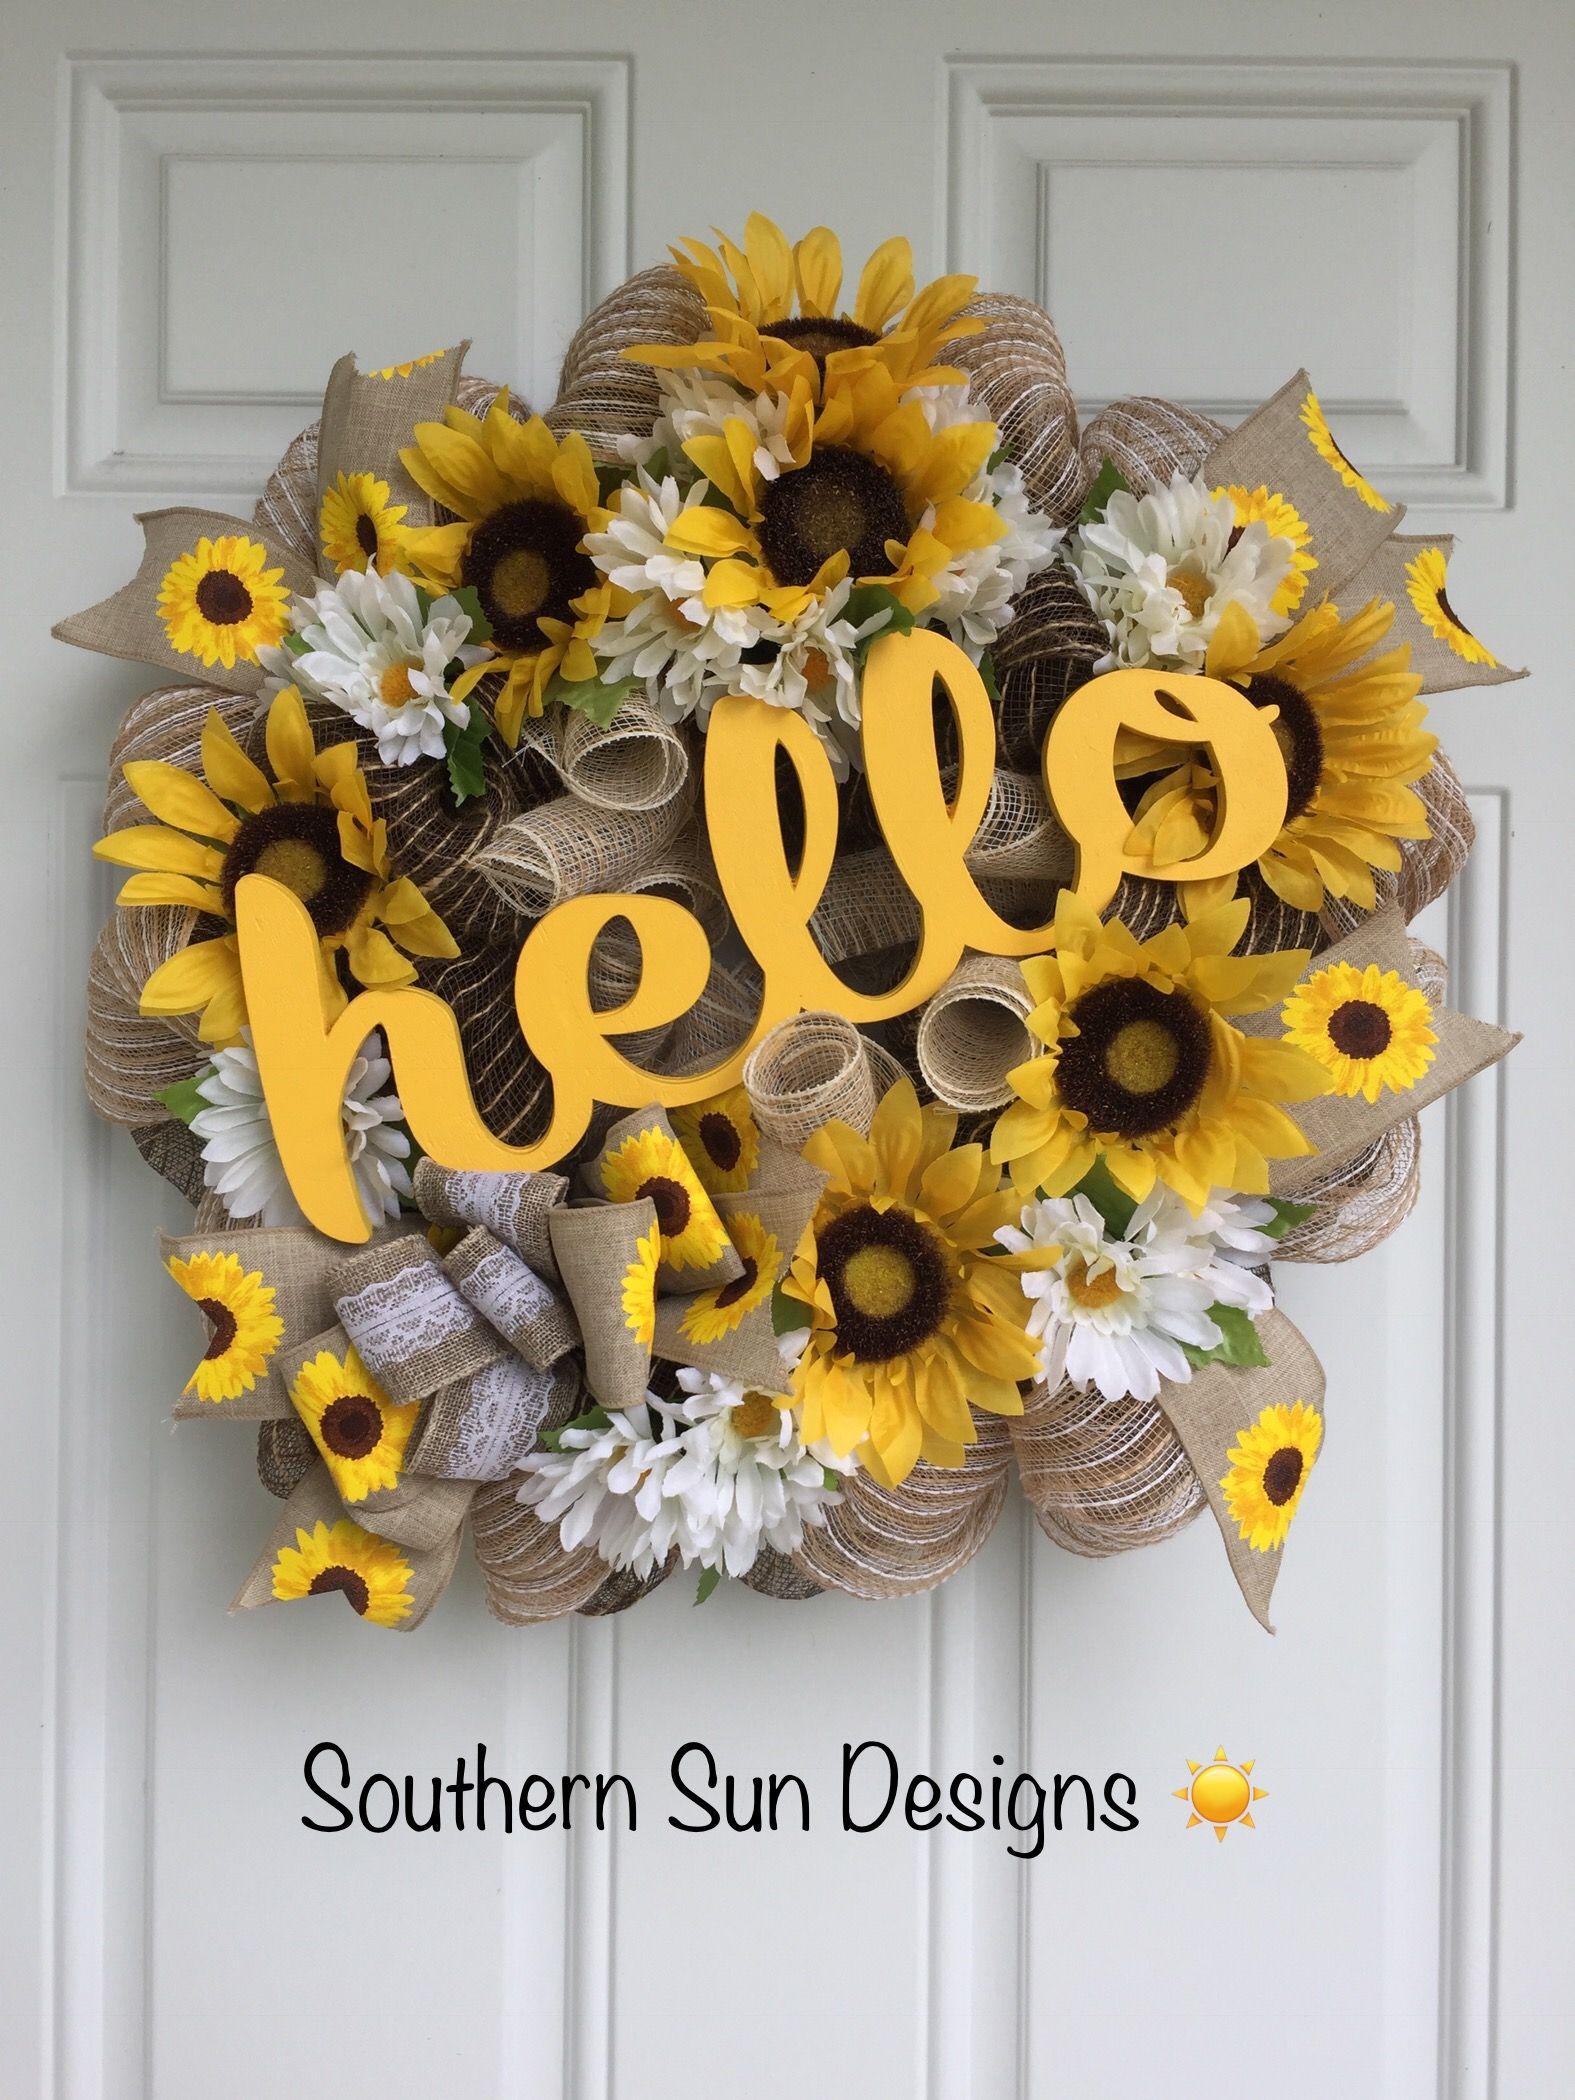 hello wreath Summer grapevine wreath floral grapevine wreath Bee grapevine wreath sunflower wreath Sunflower grapevine wreath